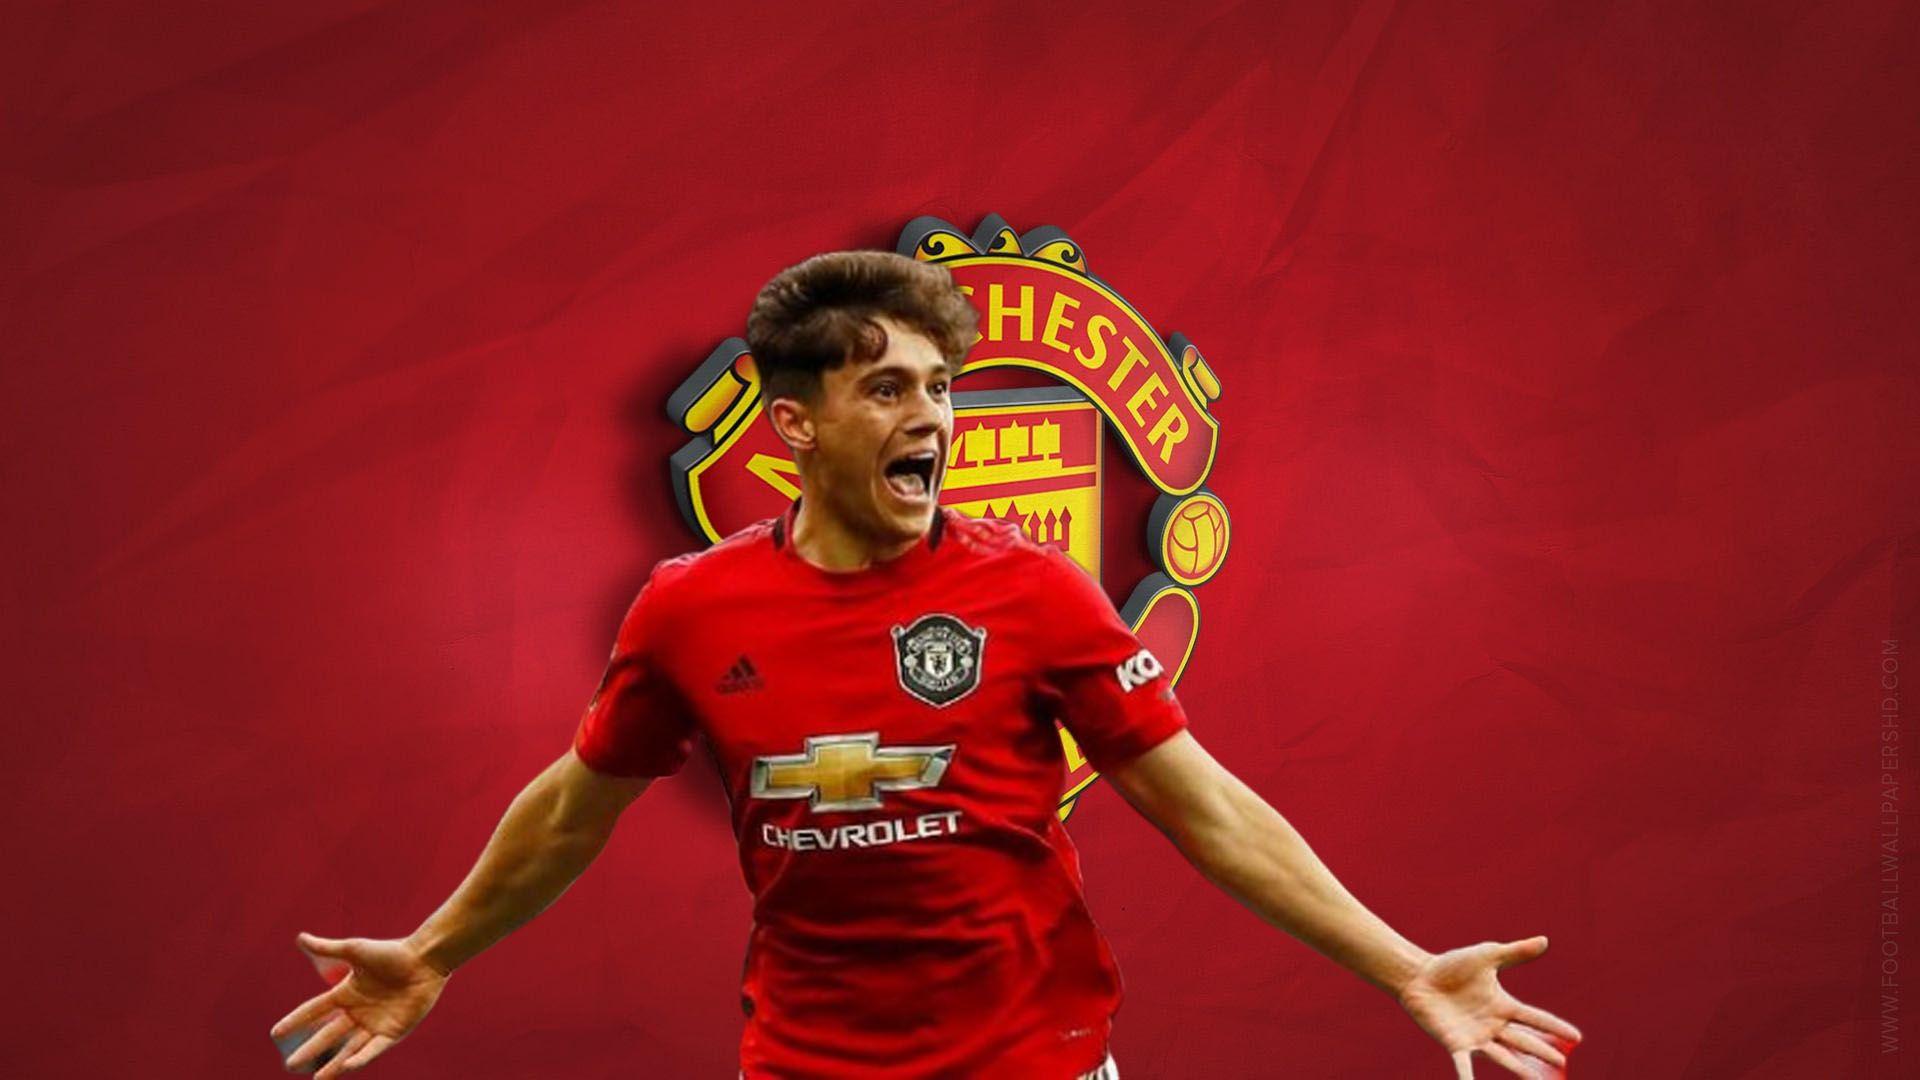 Pemain Sayap Baru Manchester United Dan Berpaspor Negara